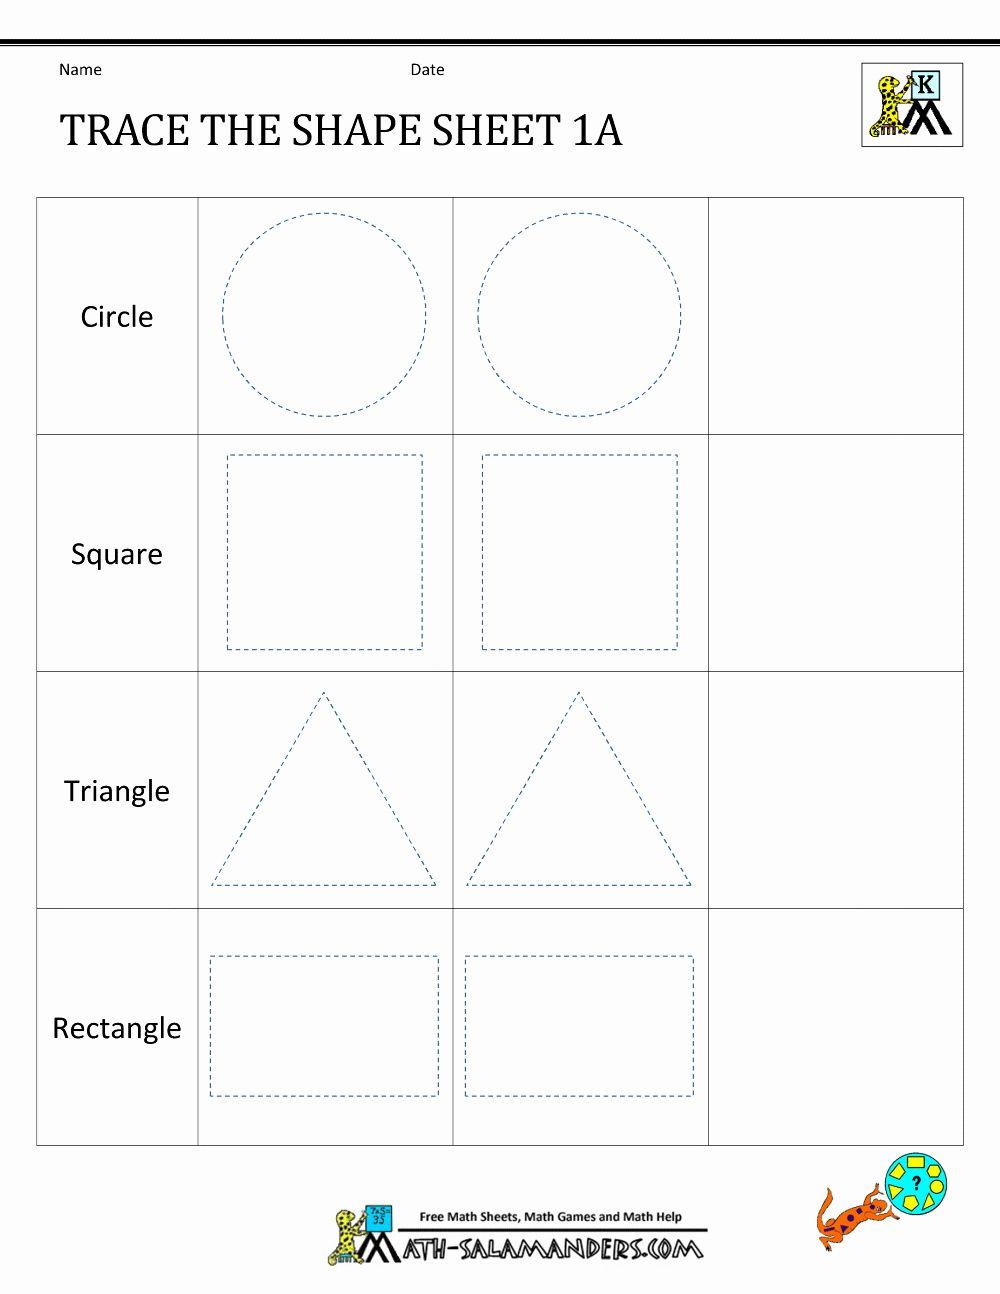 Worksheet For Preschool Free In 2020 Preschool Worksheets Kindergarten Worksheets Free Preschool [ 1294 x 1000 Pixel ]